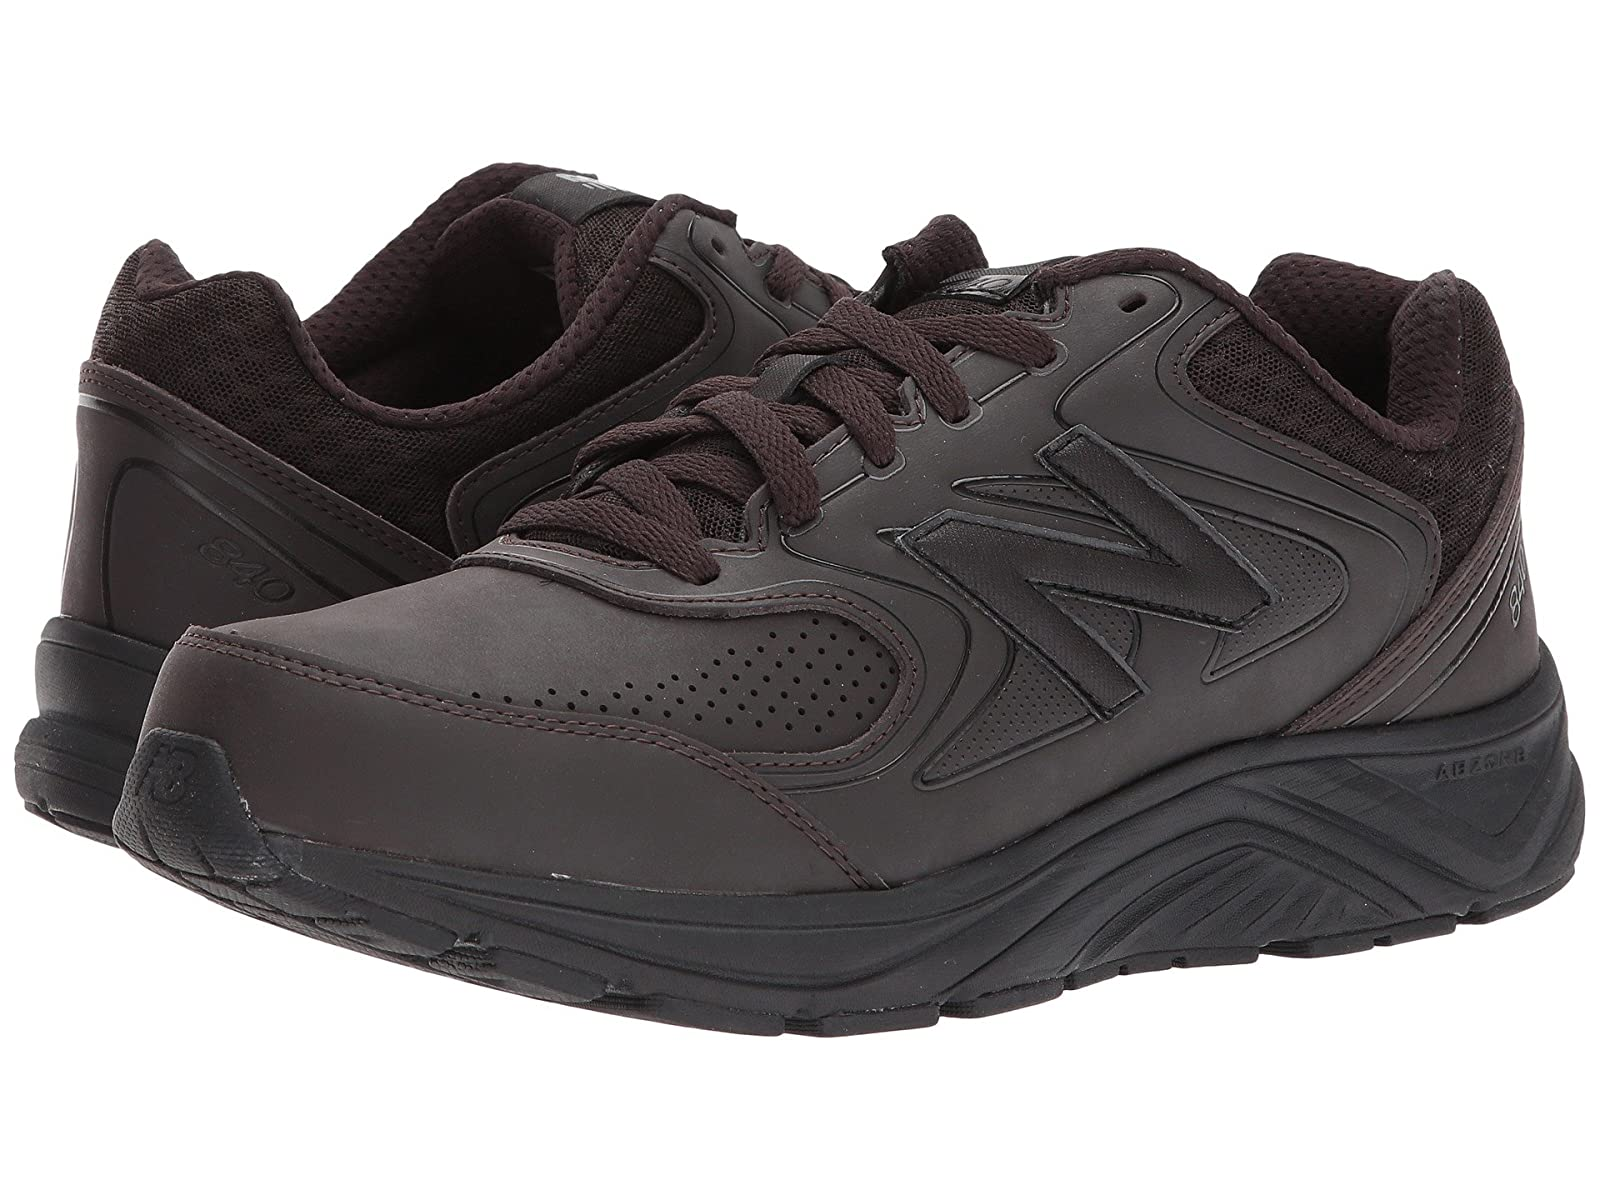 New Balance MW840v2Atmospheric grades have affordable shoes